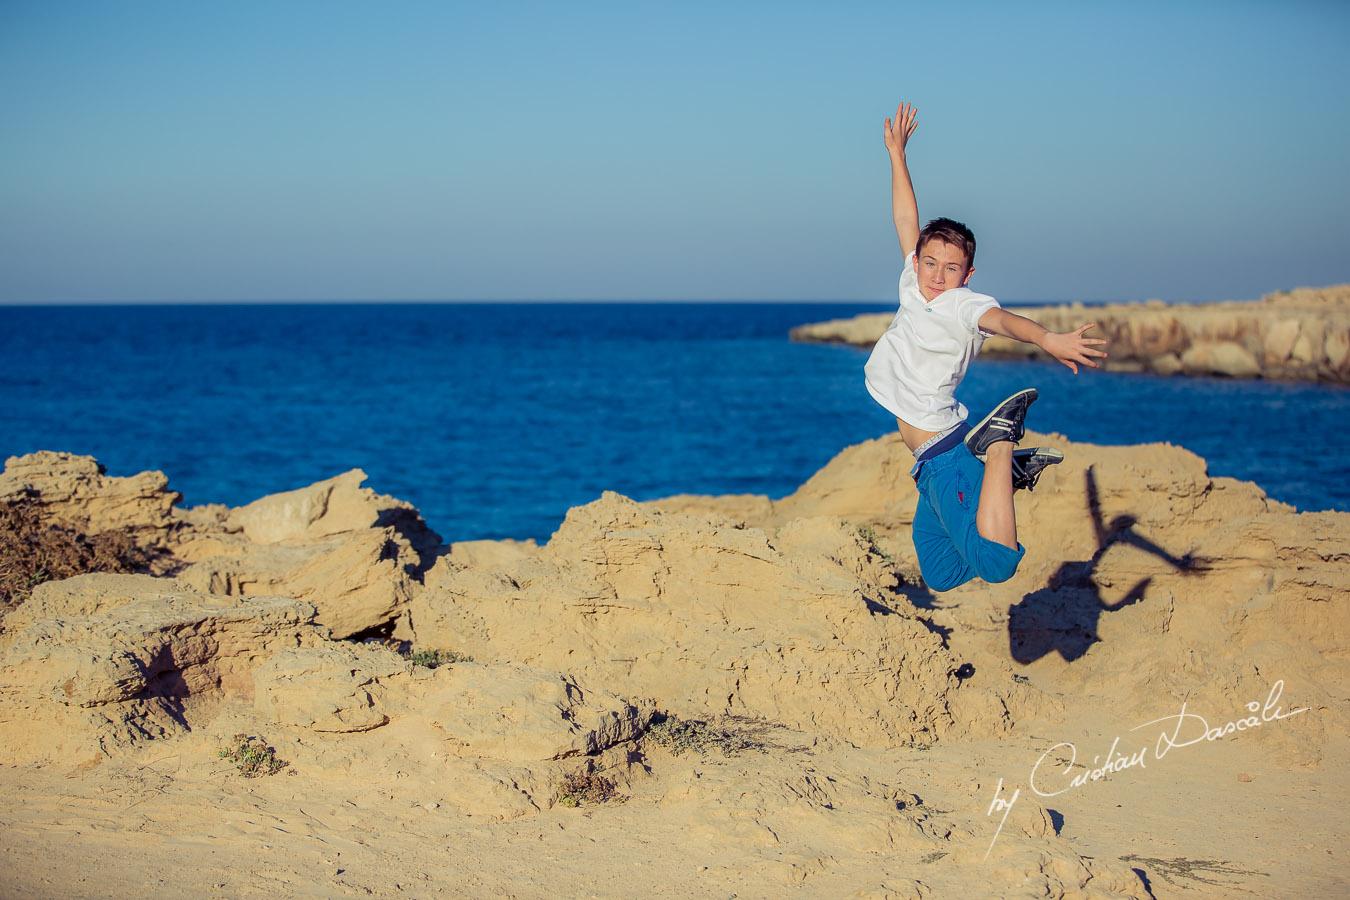 Photo Shoot in Cyprus - Anna & Konstantin in Protras, Cyprus